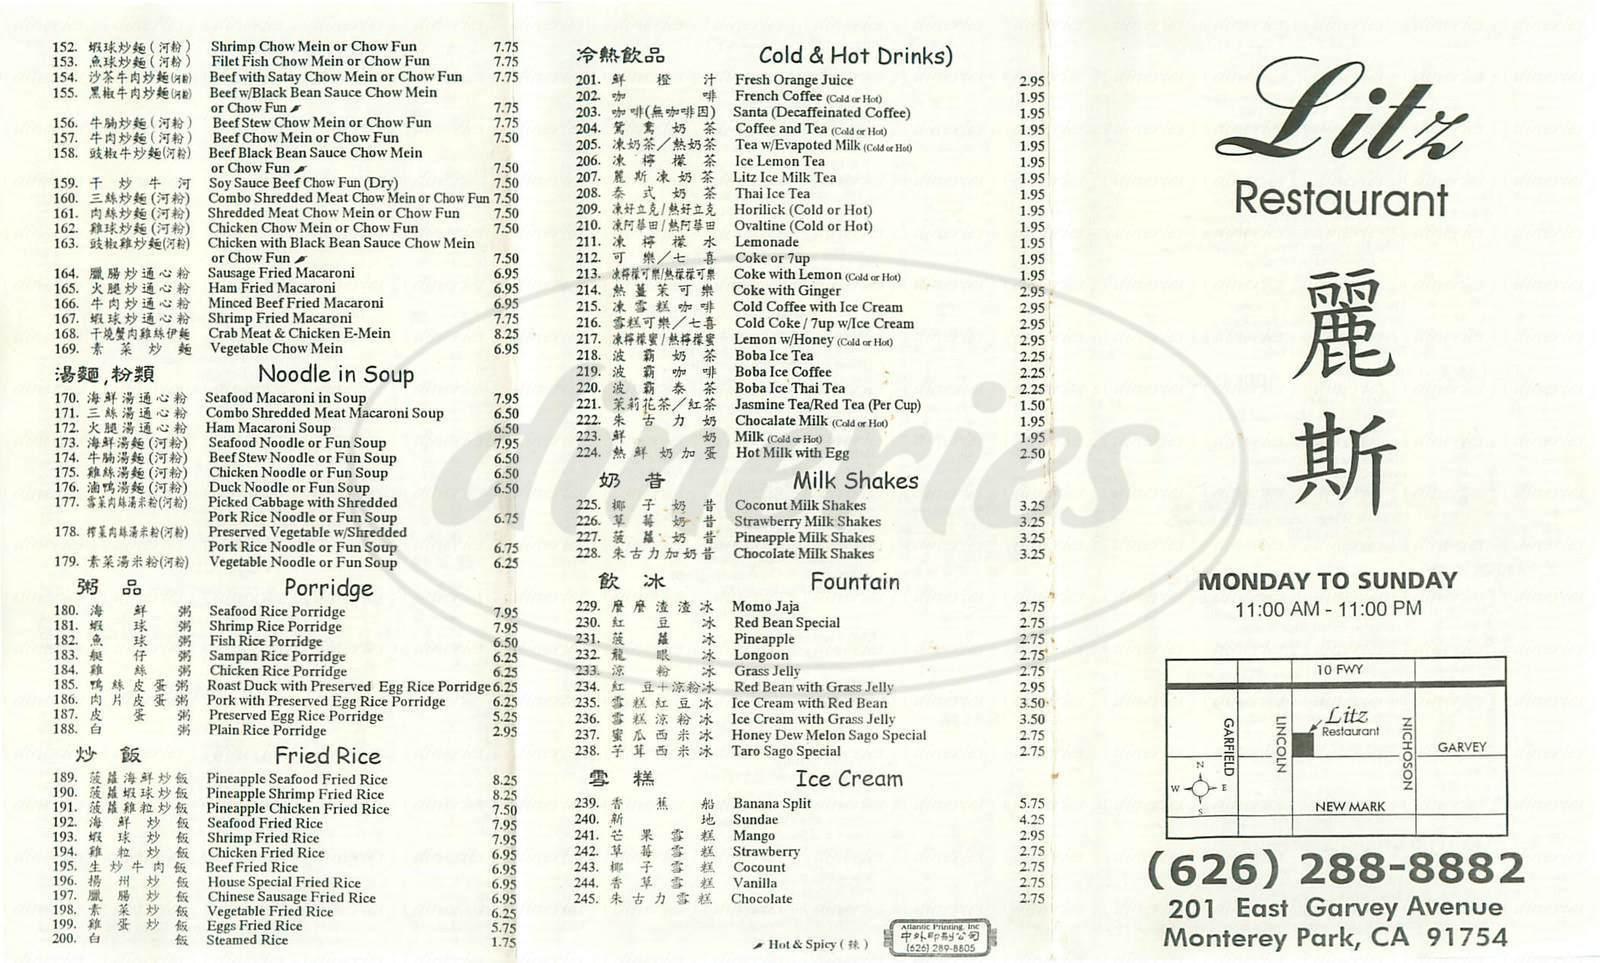 menu for Litz Restaurant